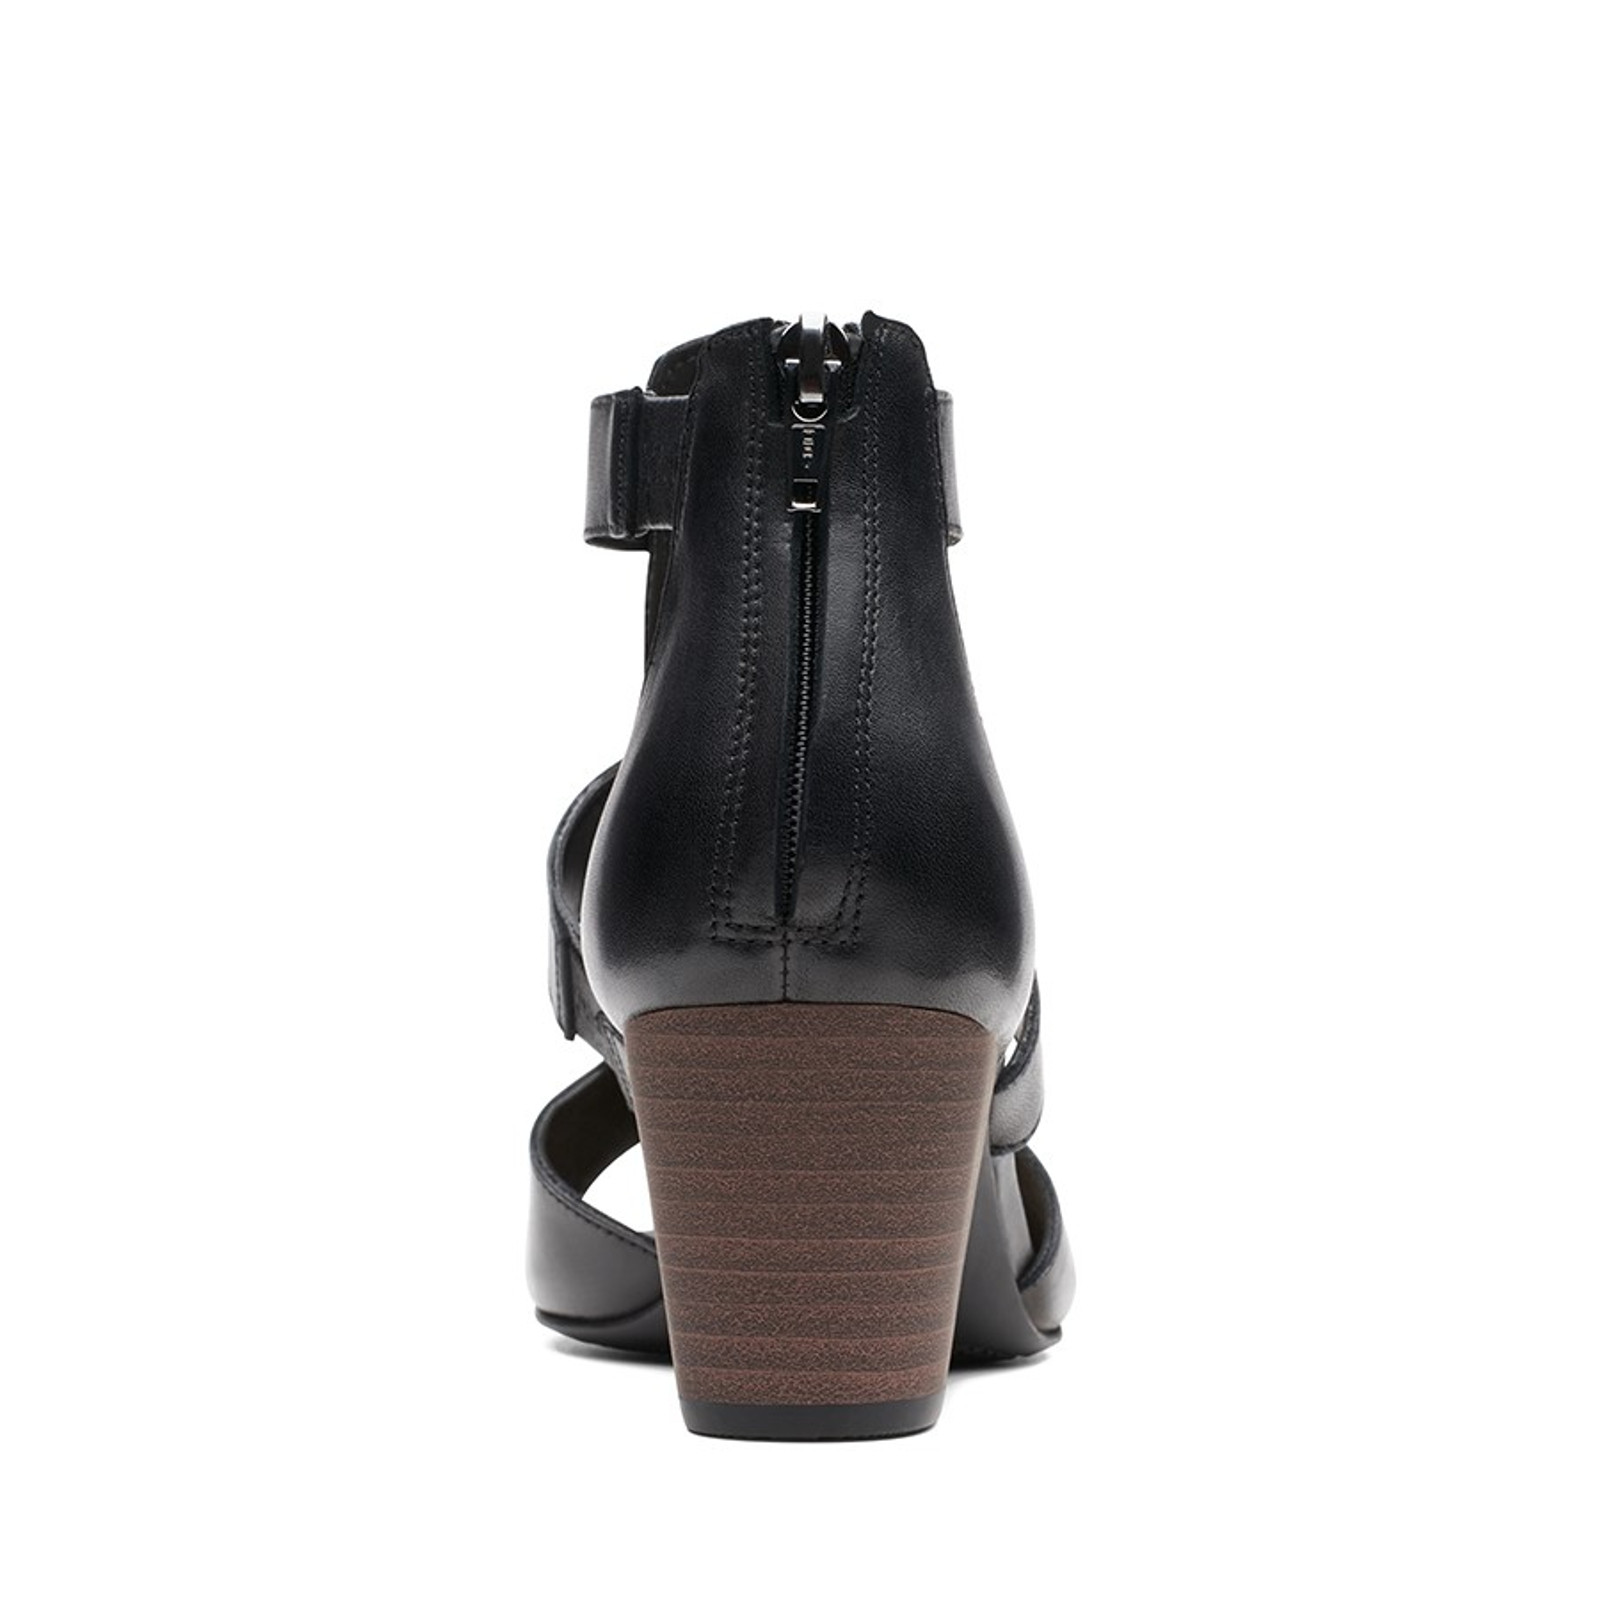 Clarks Womens DELORIA FAE Black Leather